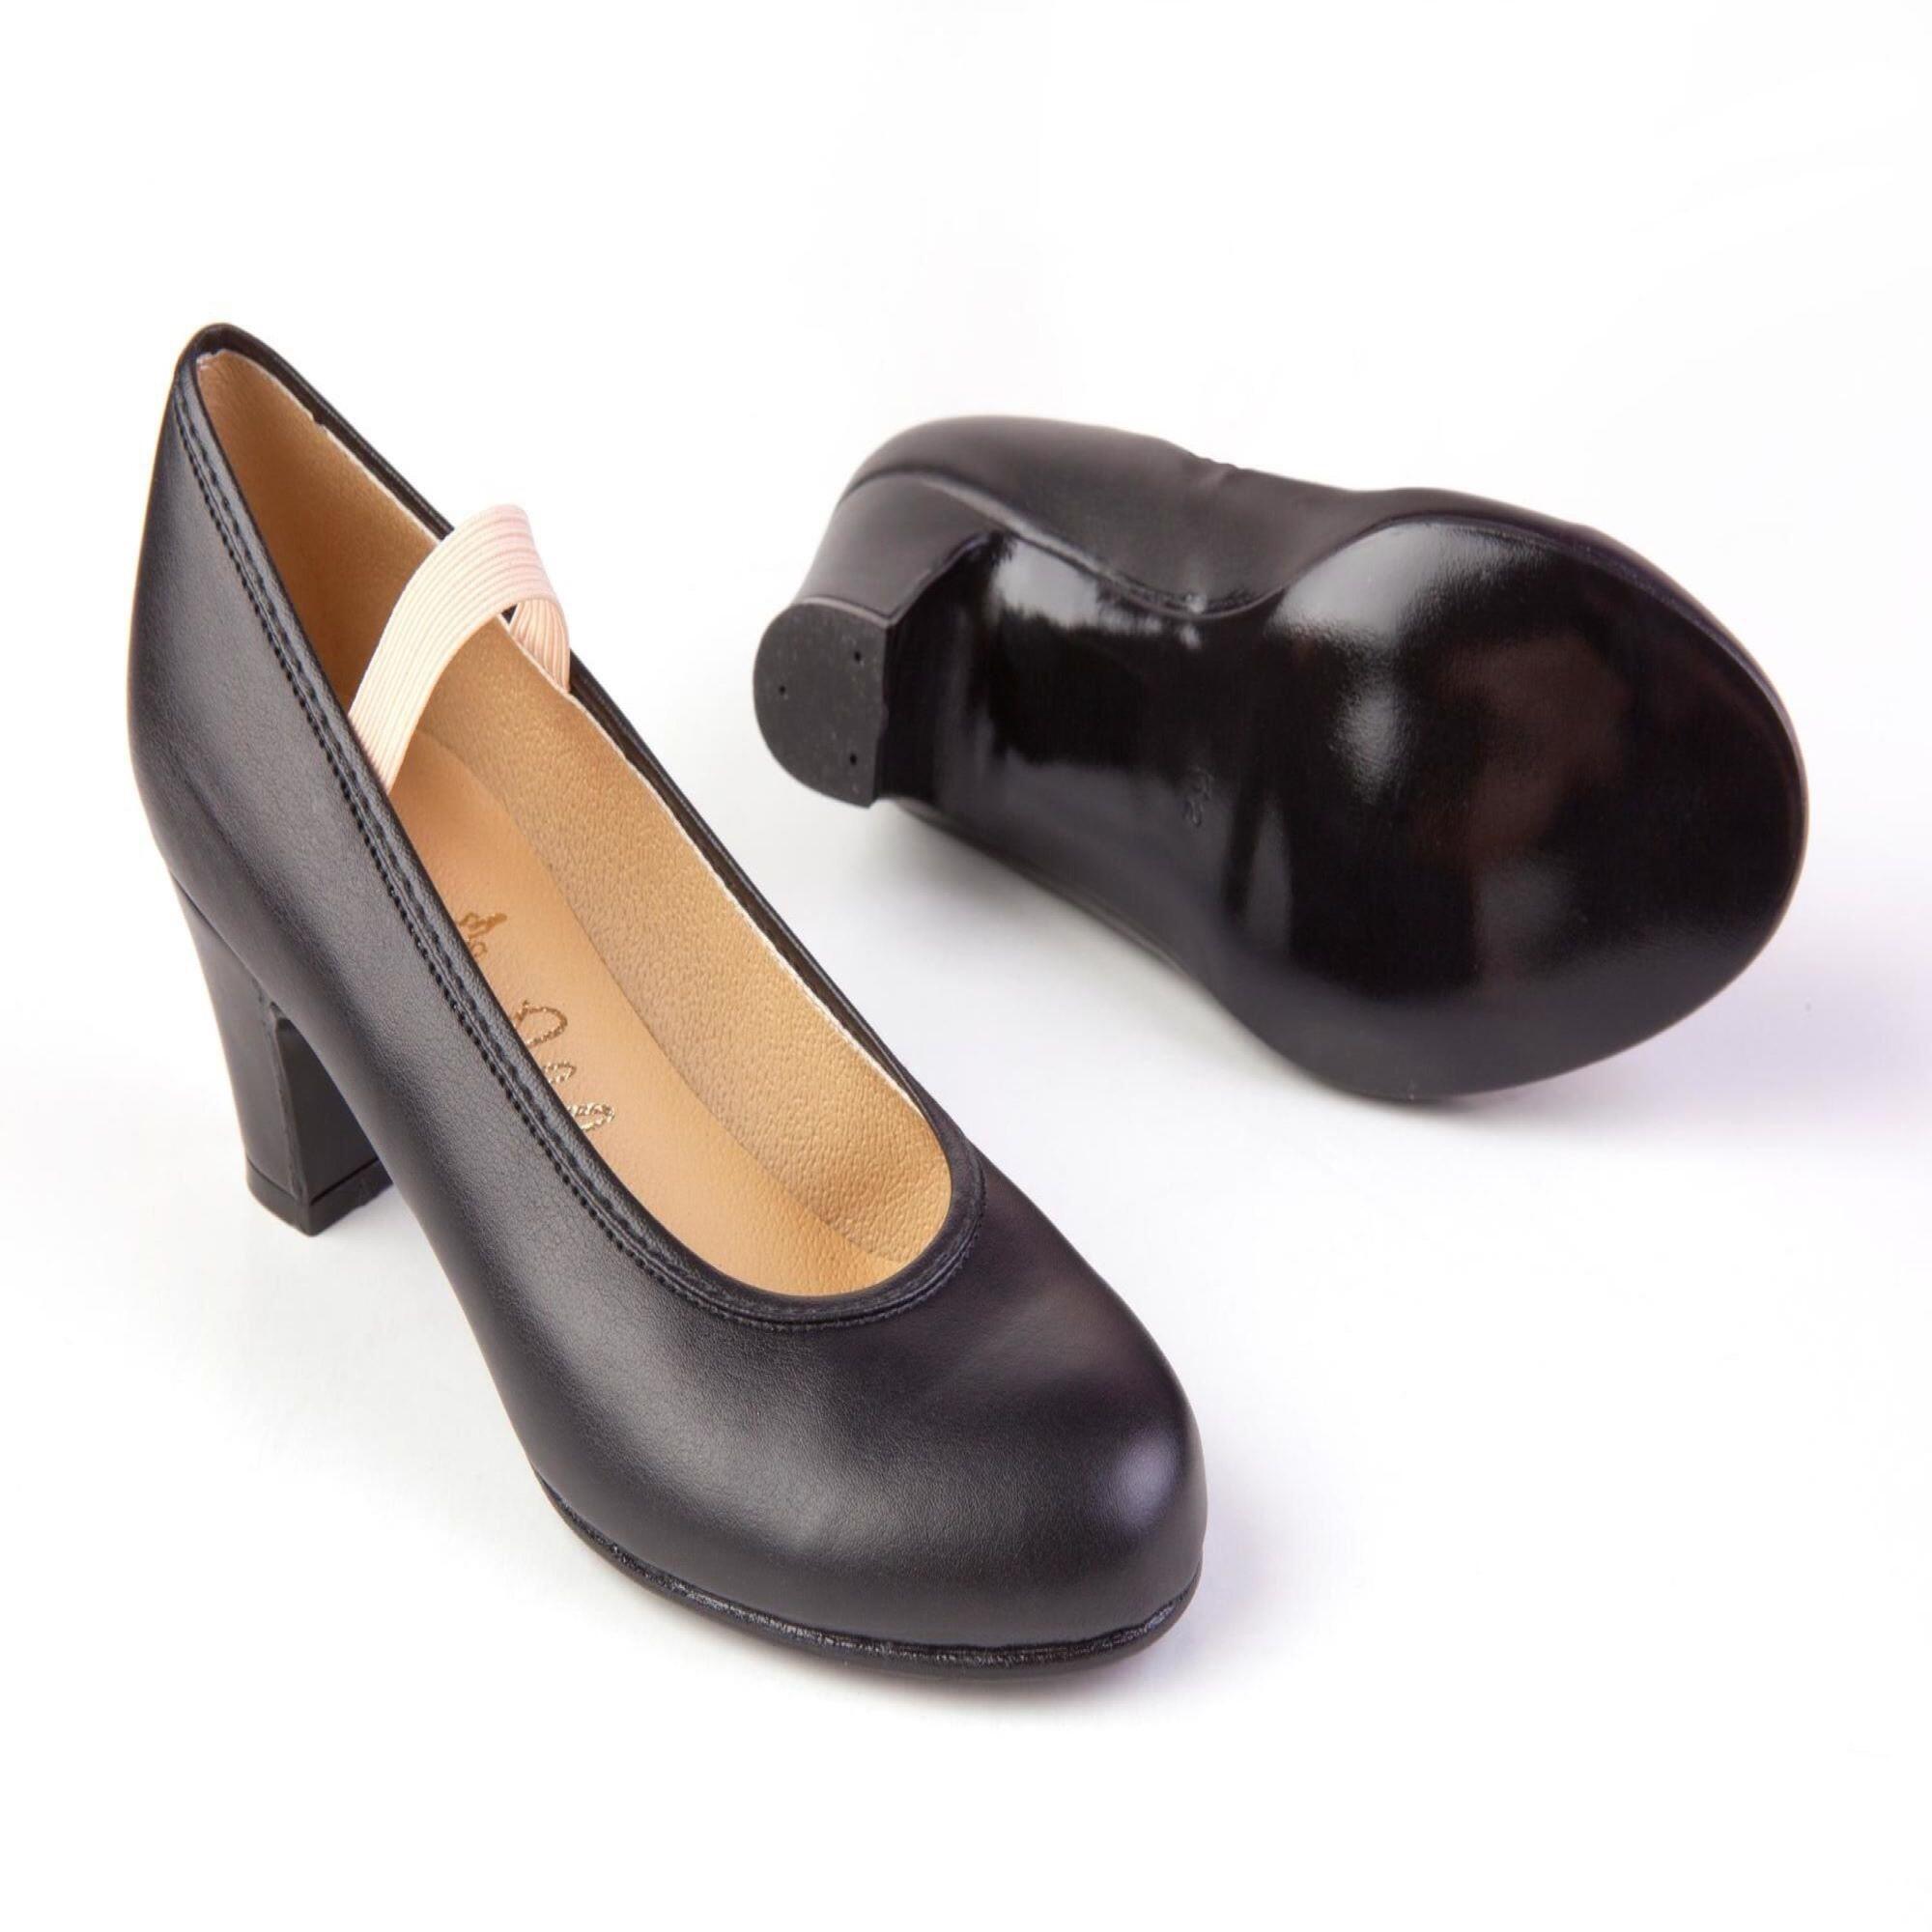 2db67044b Zapatos Flamenco Yebra mujer/niñas sin clavos negro